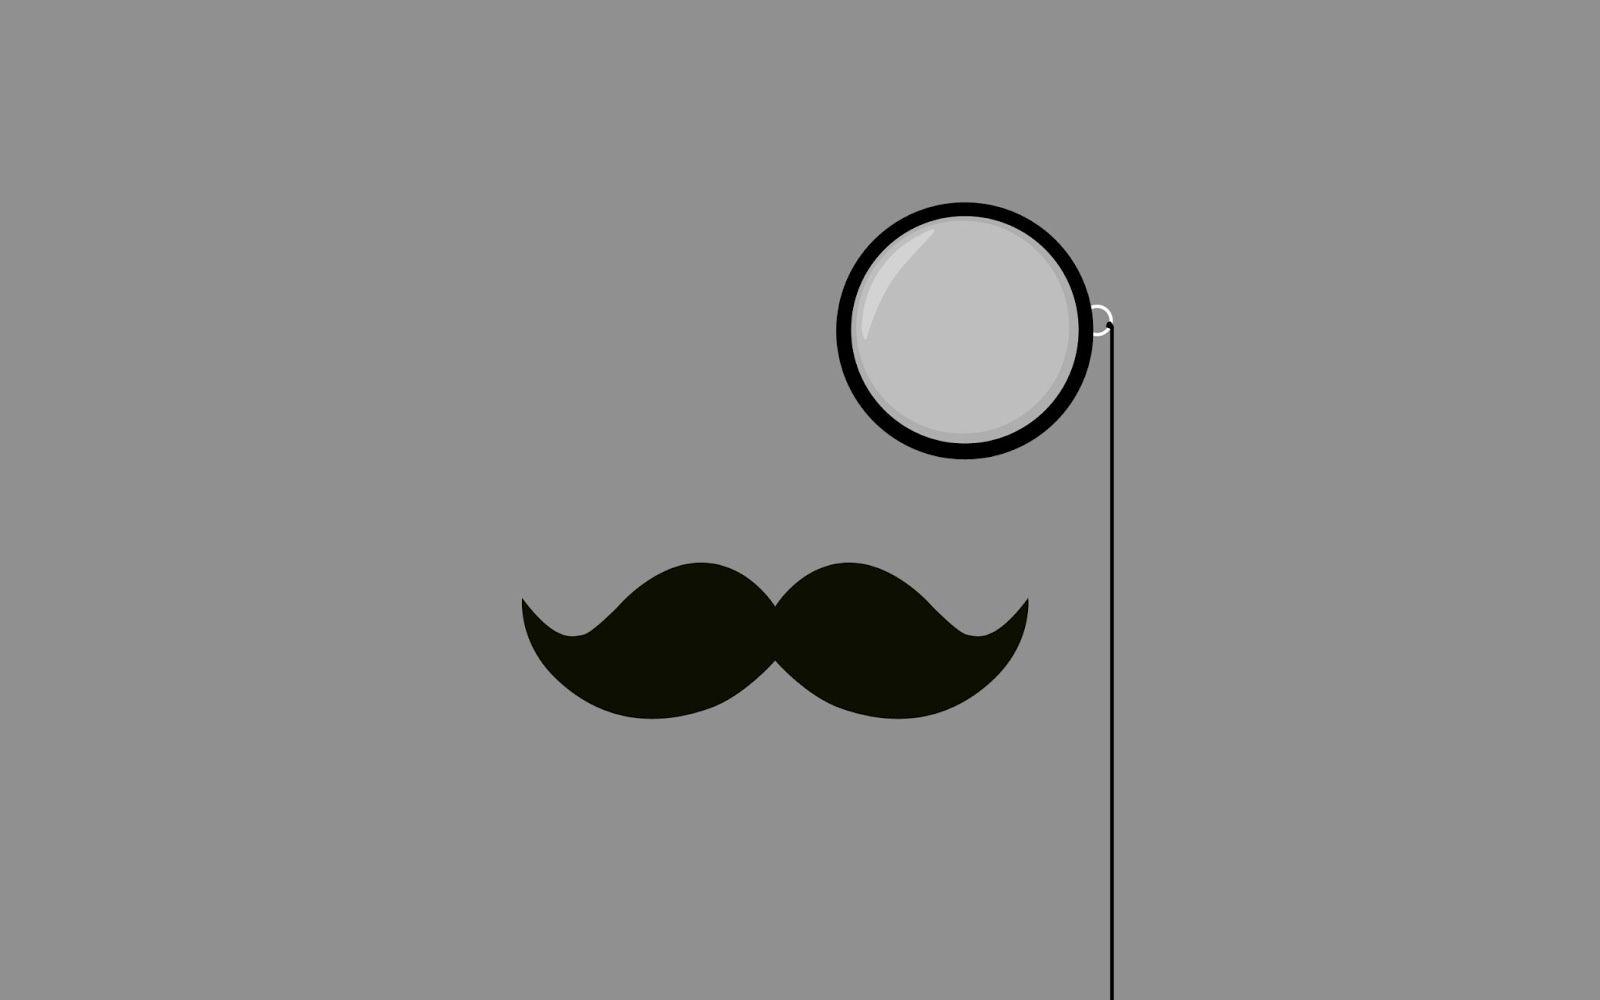 Wallpaper iphone tumblr mustache - Explore Cool Wallpaper Desktop Backgrounds And More